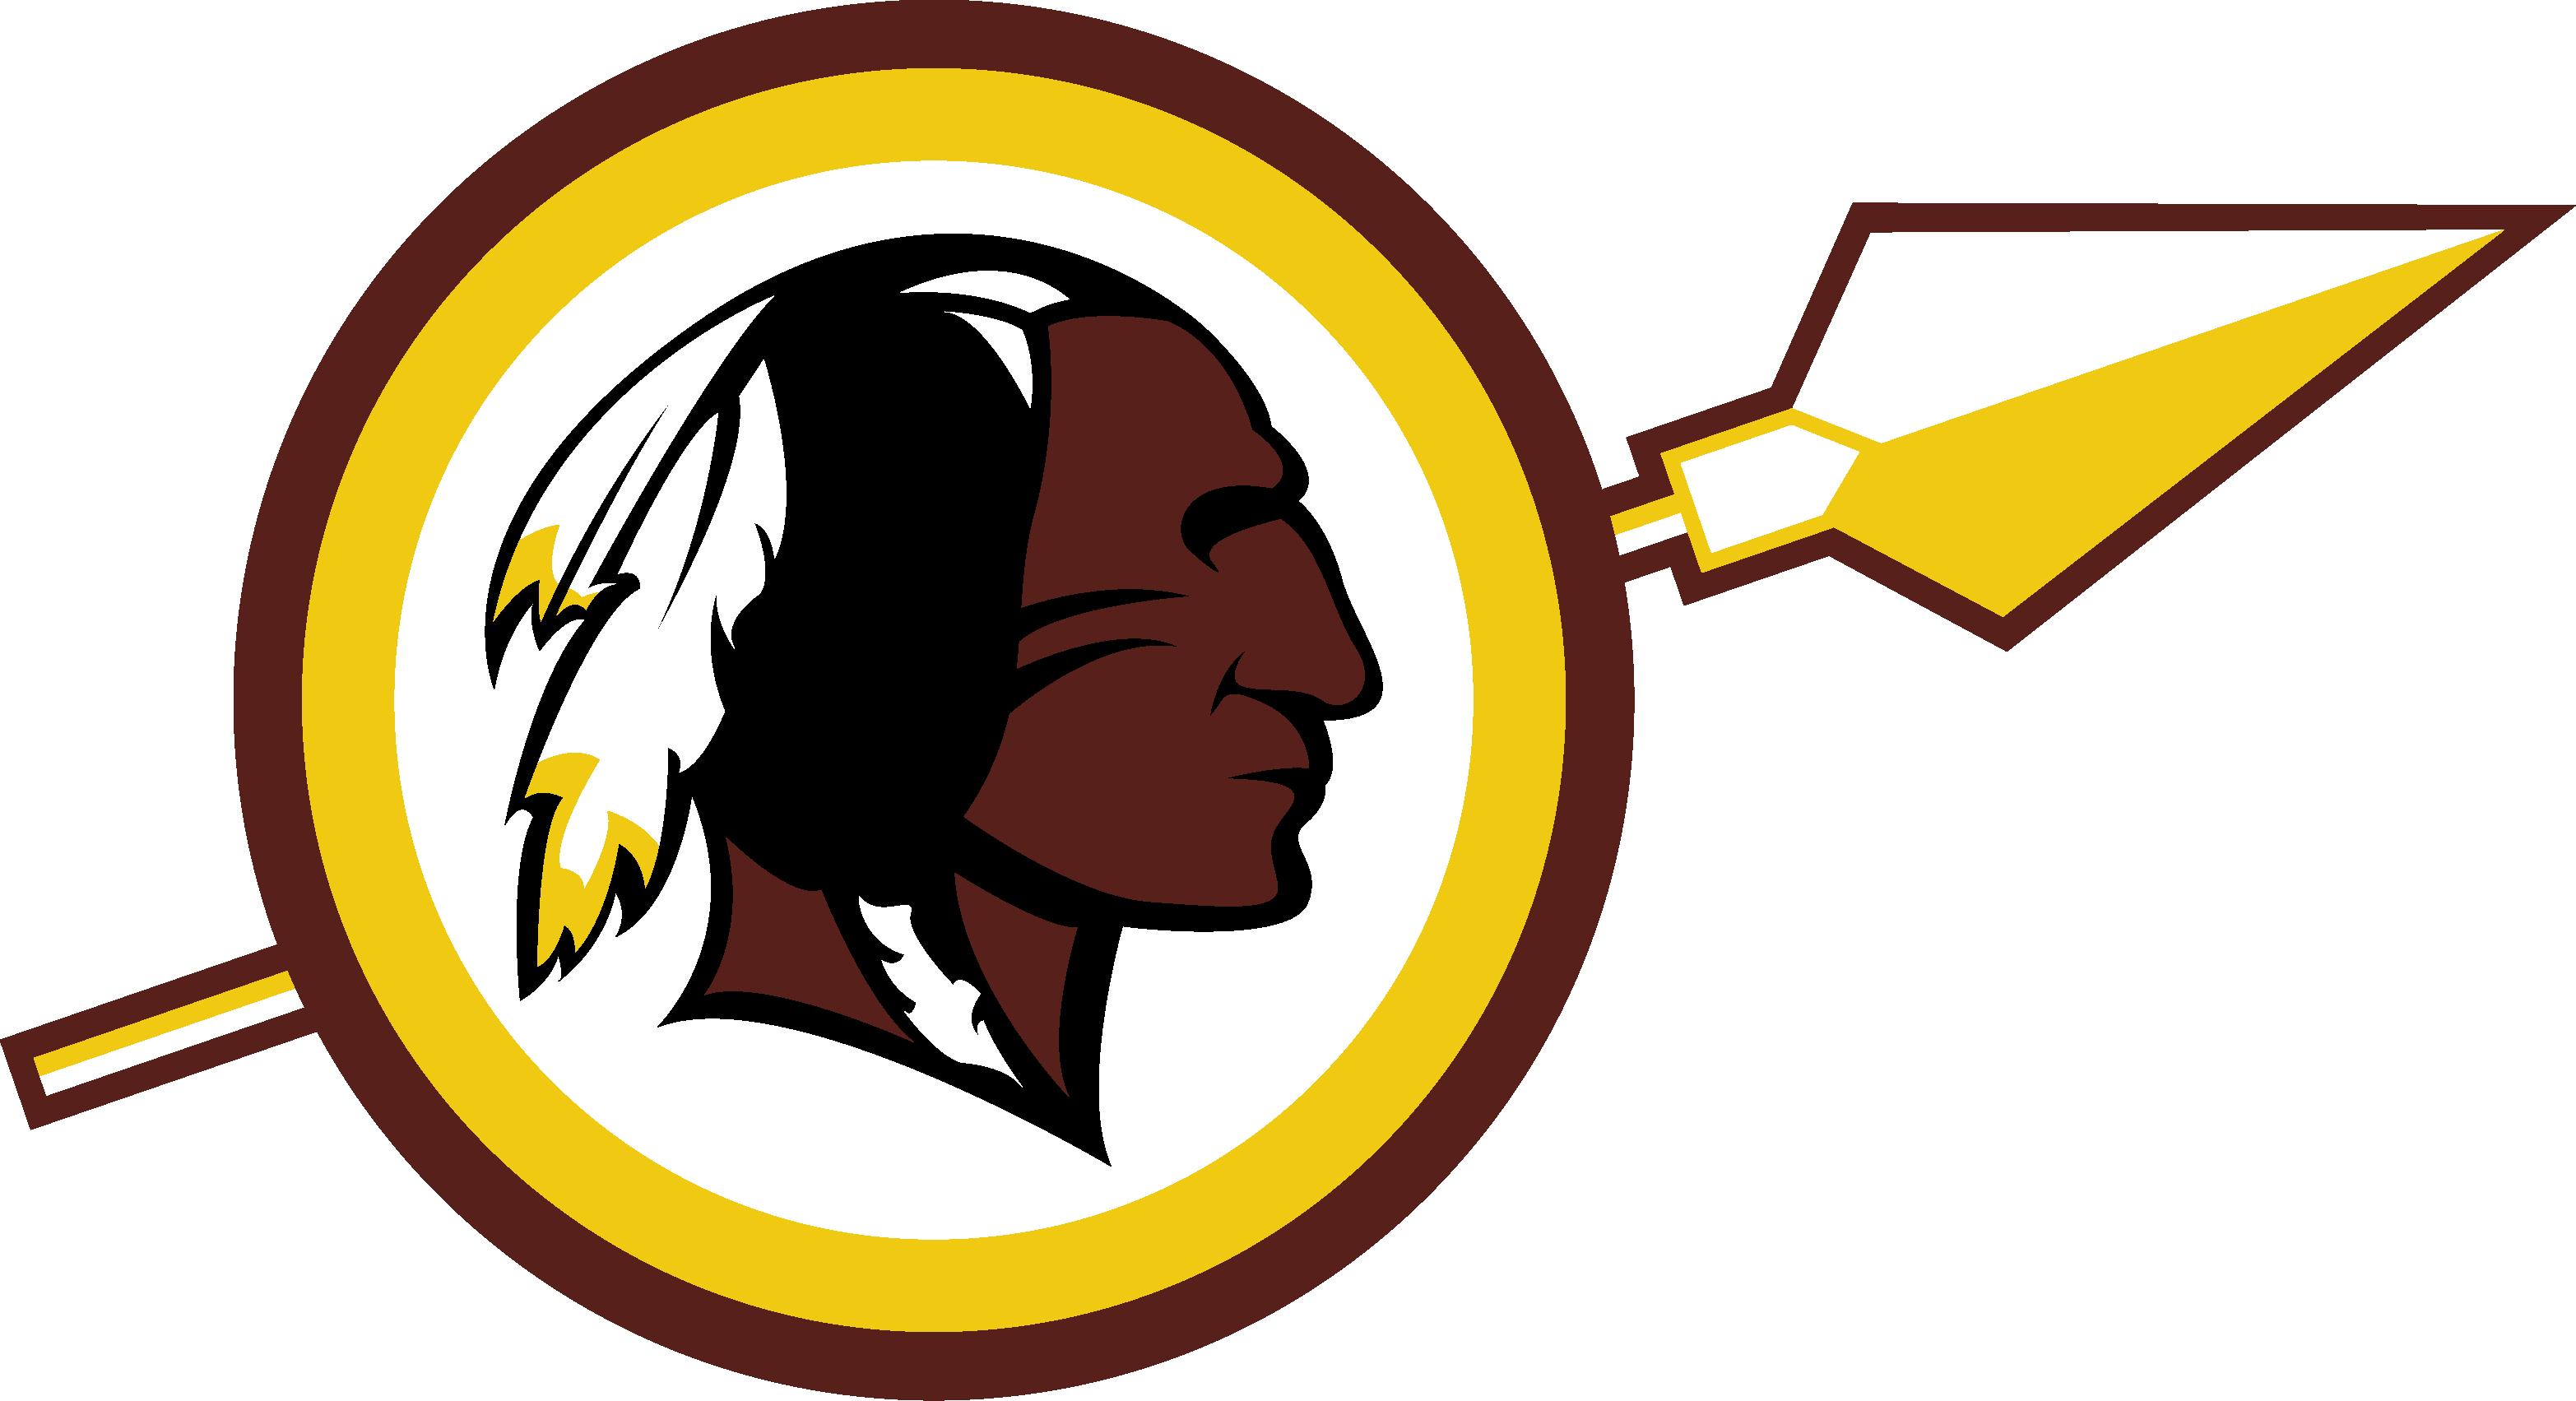 Redskins clipart clipart royalty free Washington Redskins PNG Images Transparent Free Download ... clipart royalty free